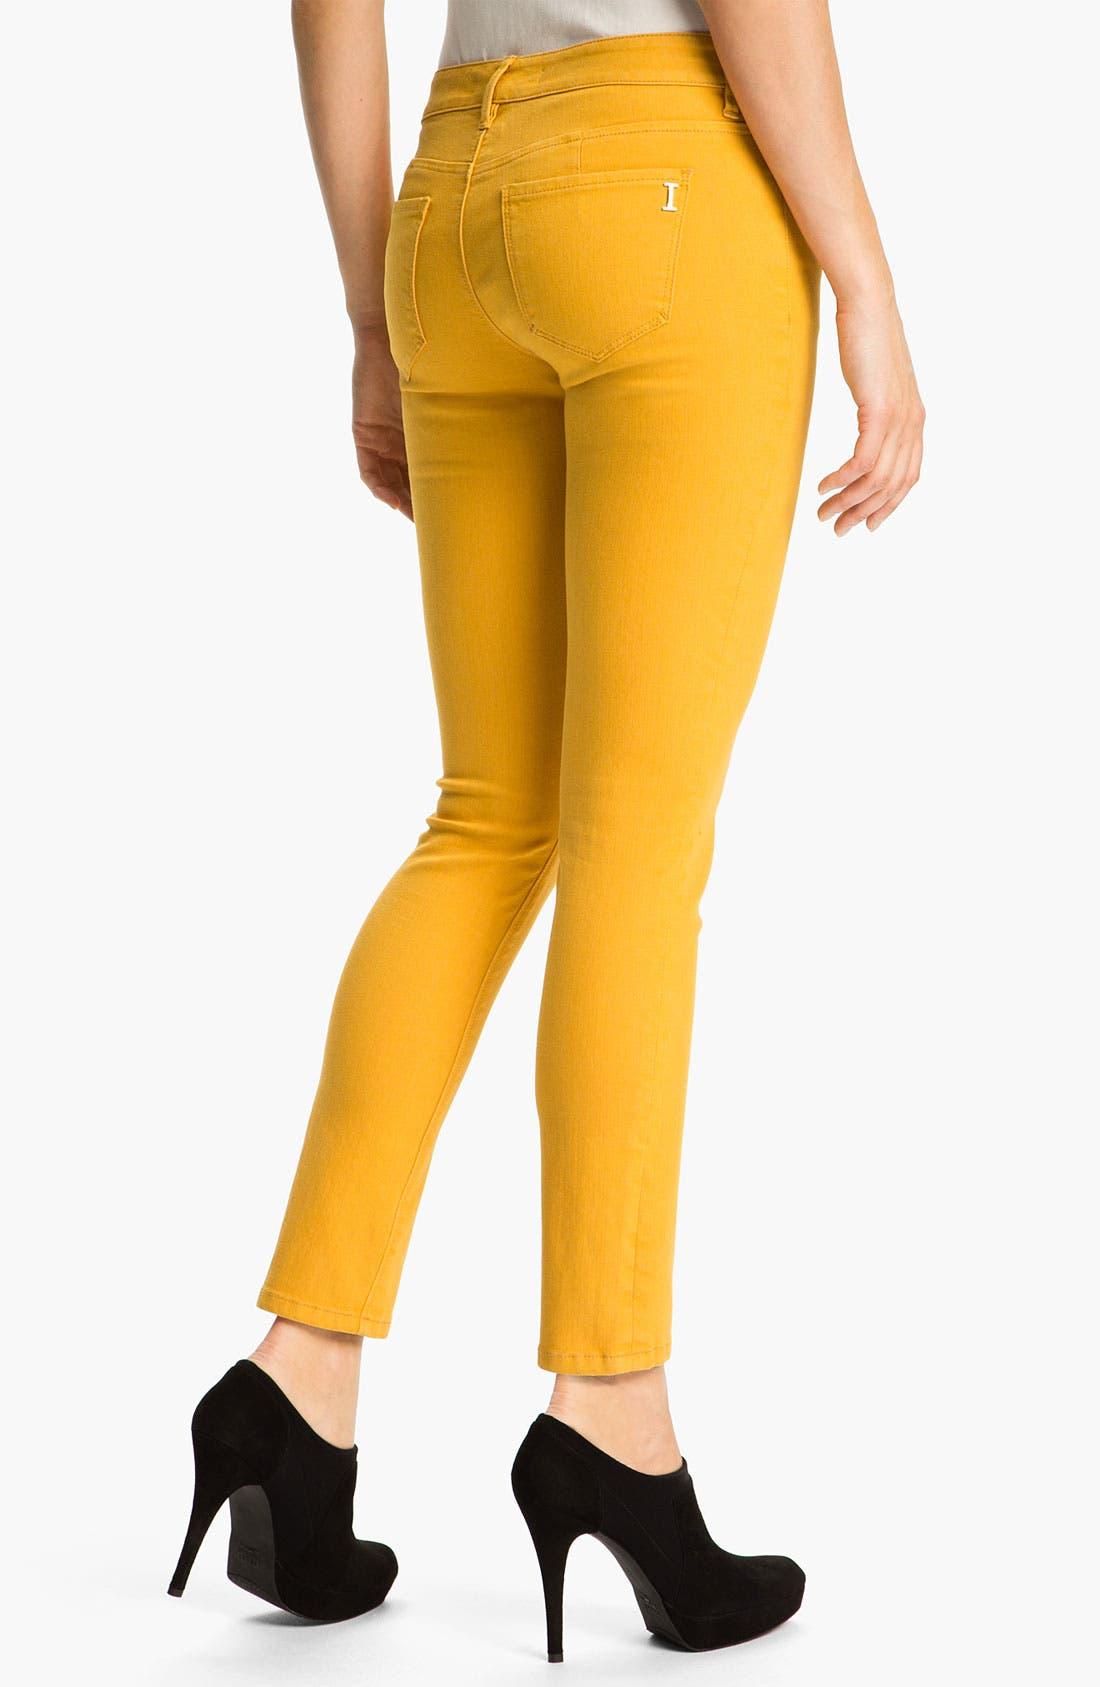 Alternate Image 2  - Isaac Mizrahi Jeans 'Samantha' Colored Skinny Jeans